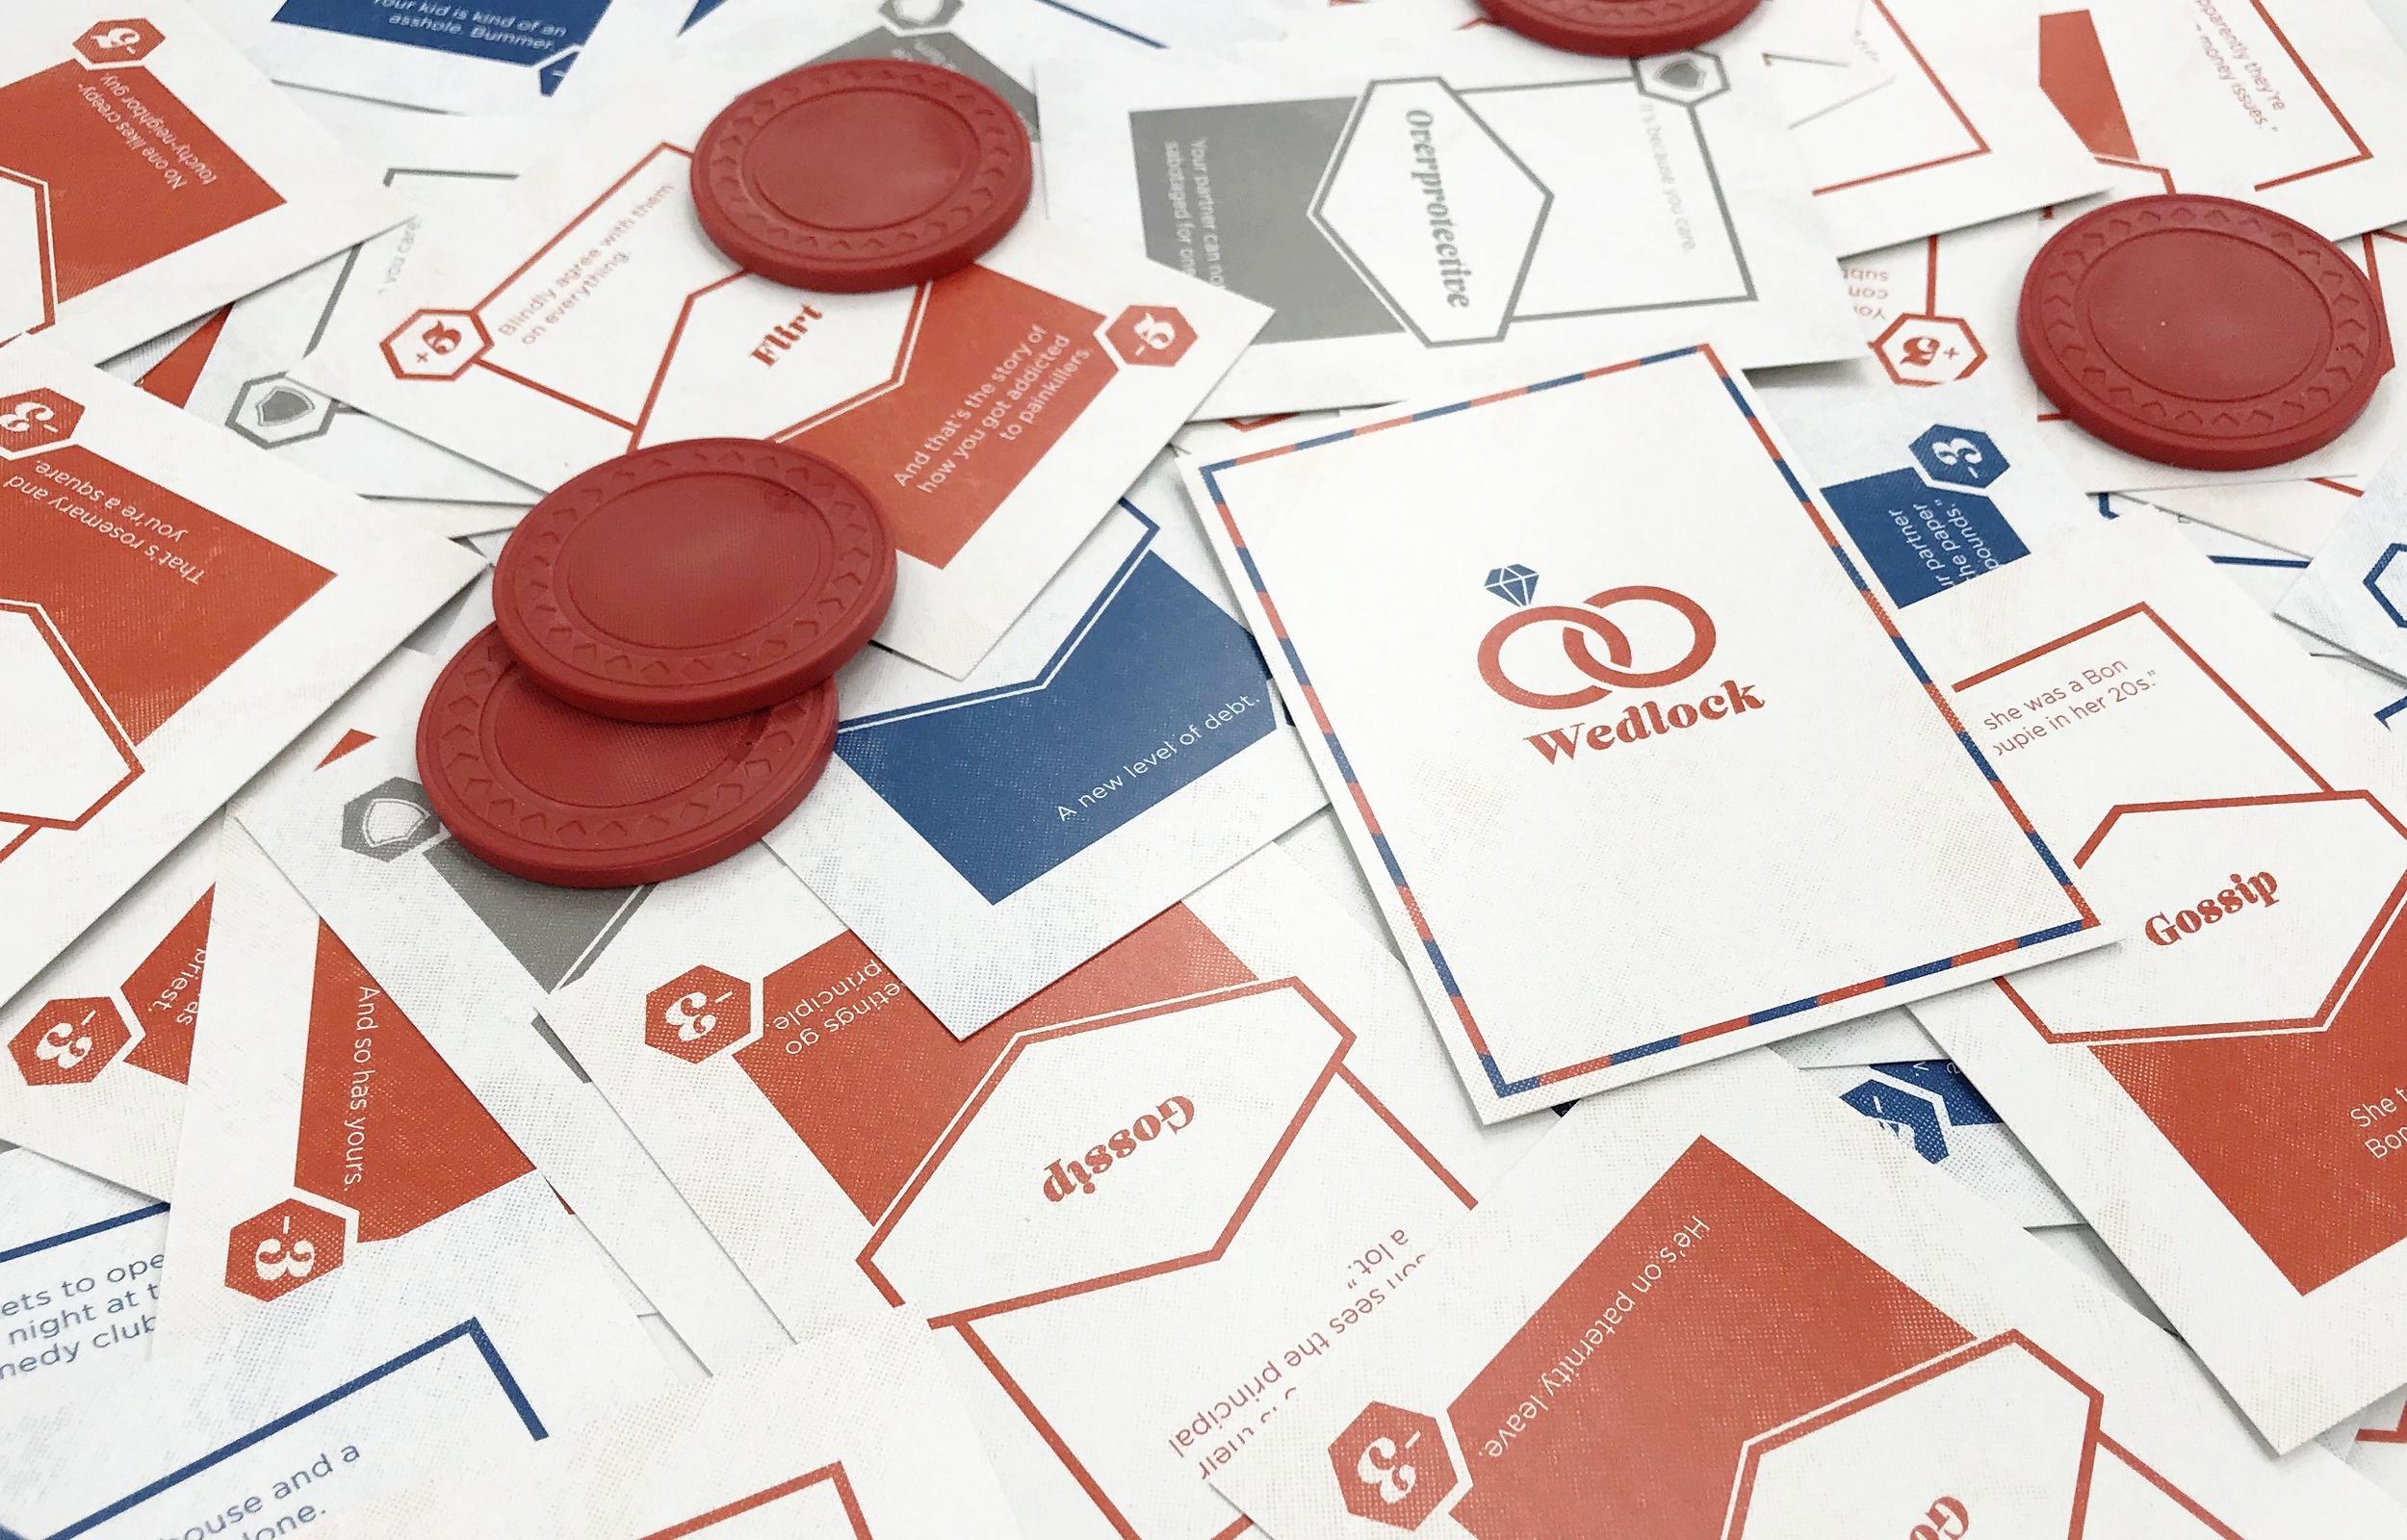 cards-pile.jpg